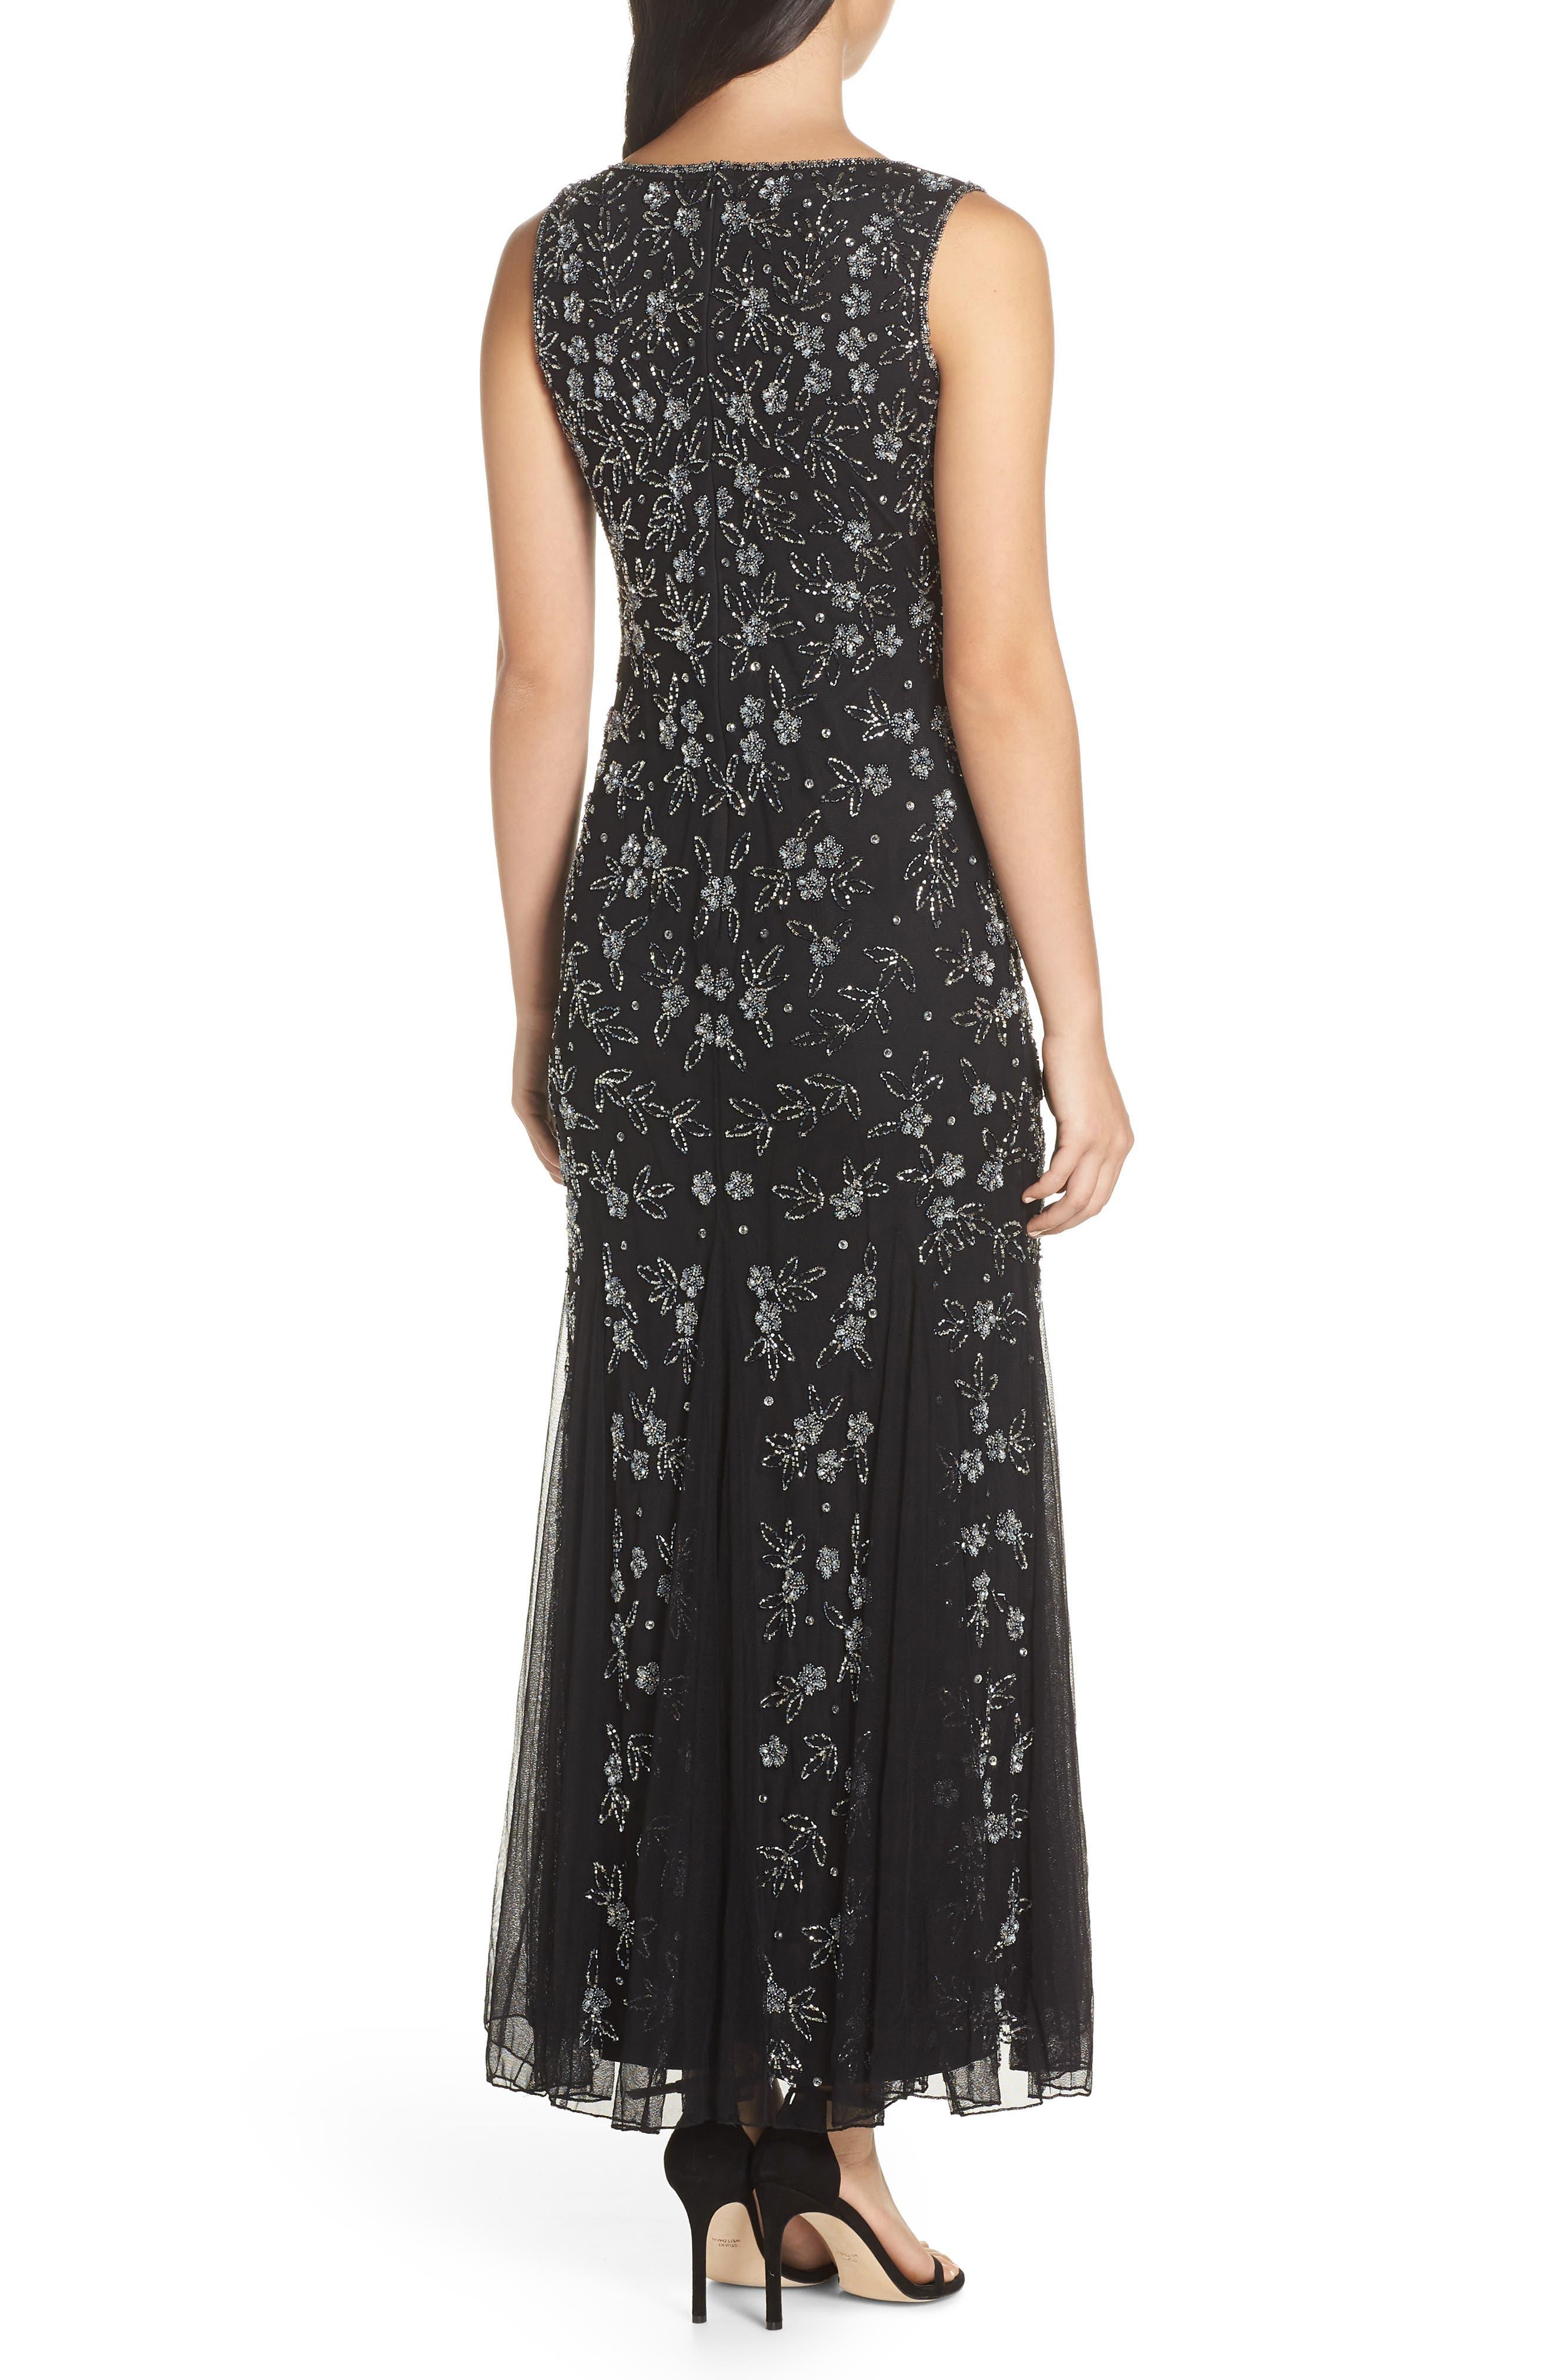 PISARRO NIGHTS, Beaded Godet Gown, Alternate thumbnail 2, color, 001